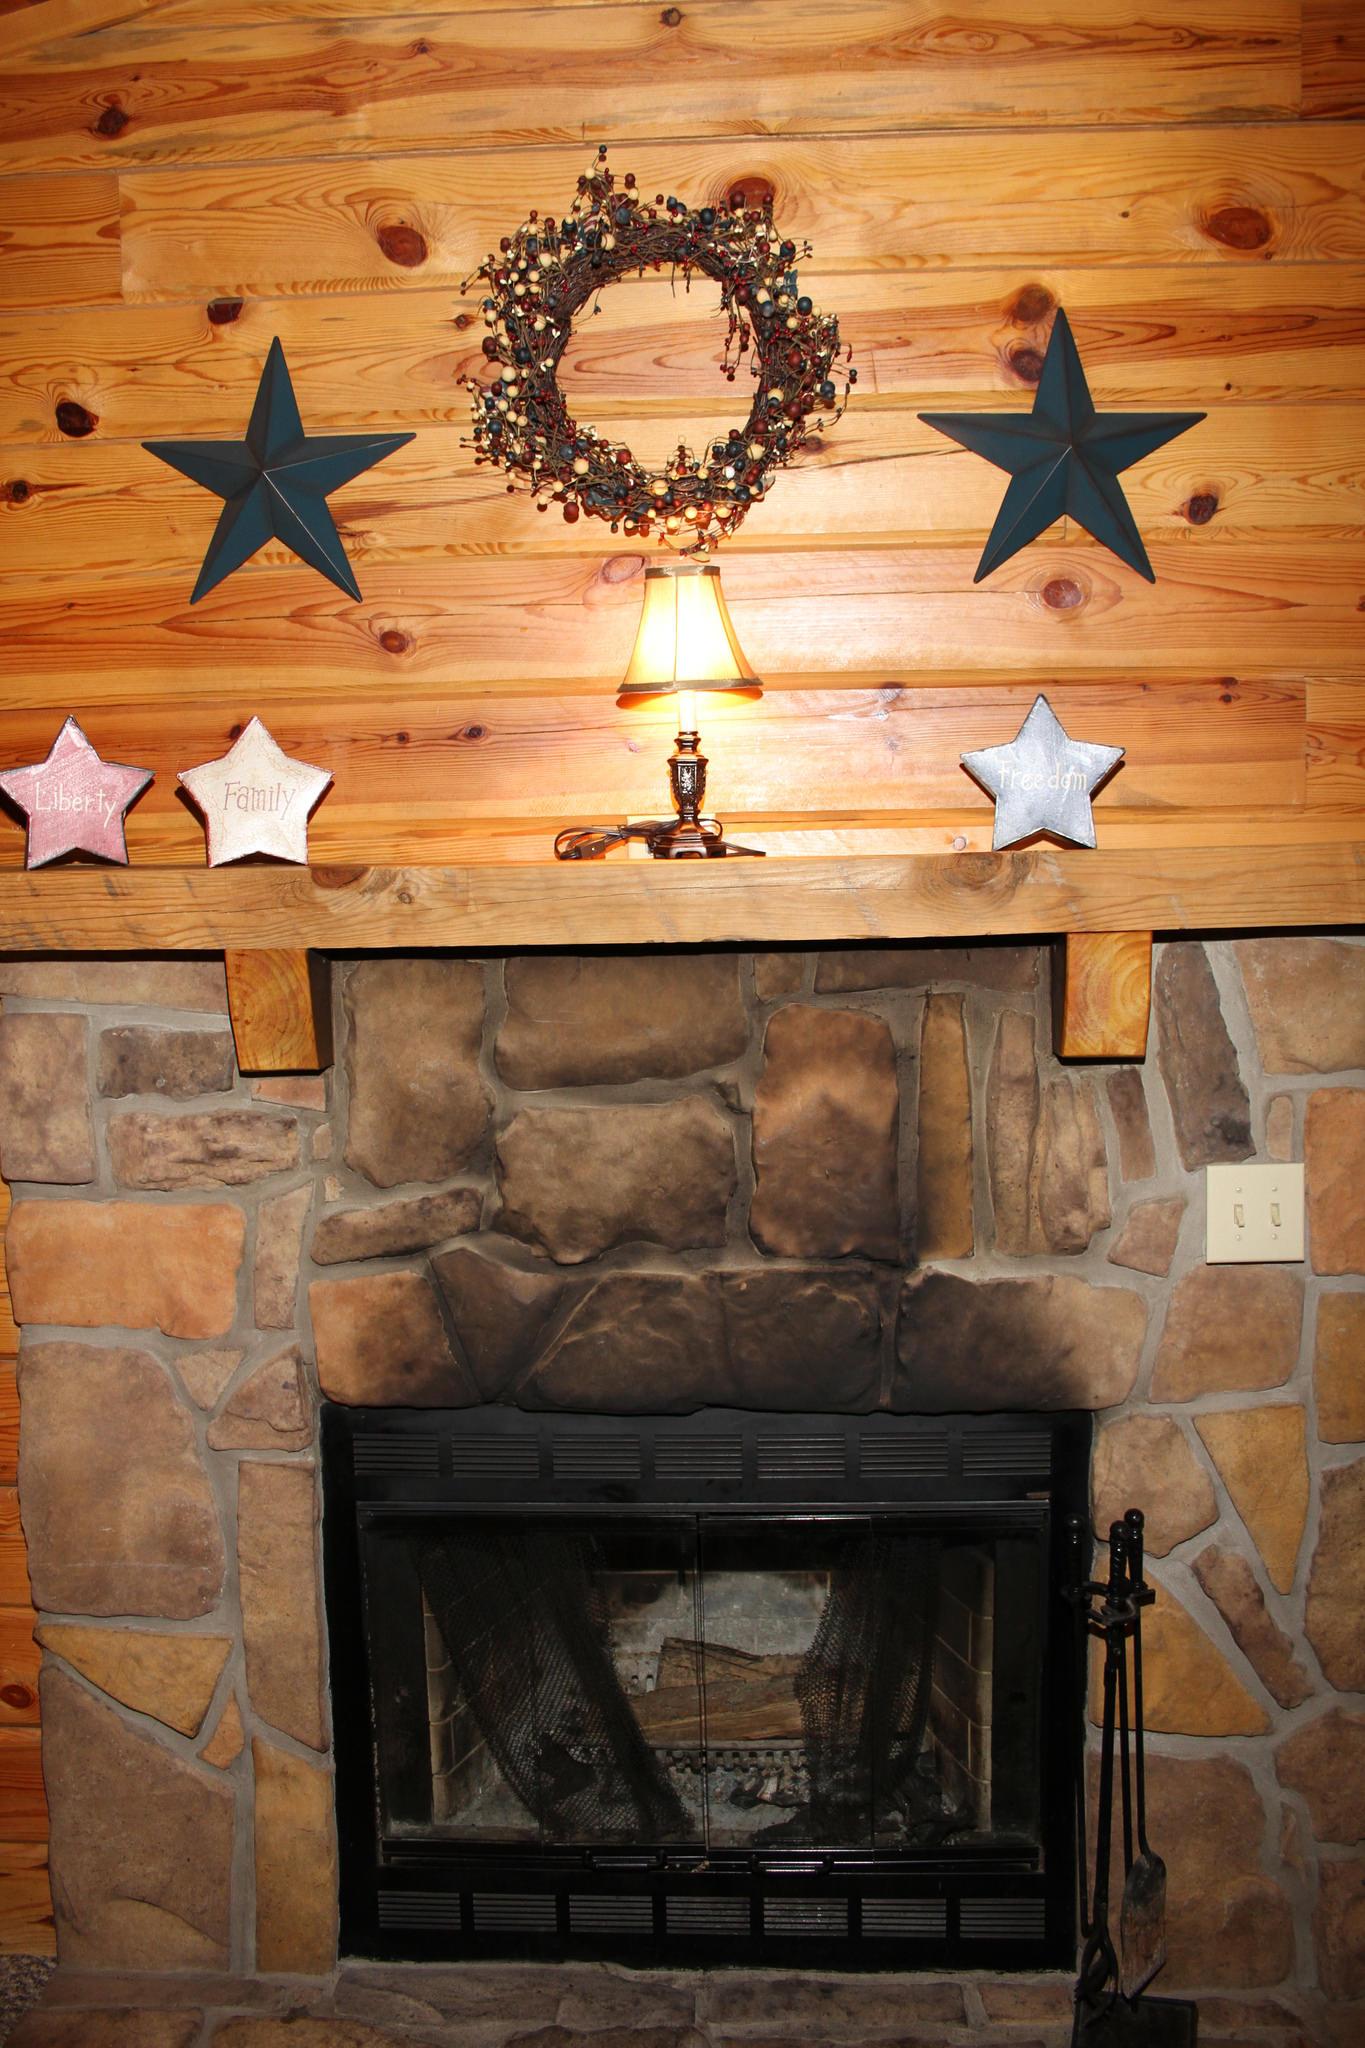 Fireplace - Wood burning fireplace.